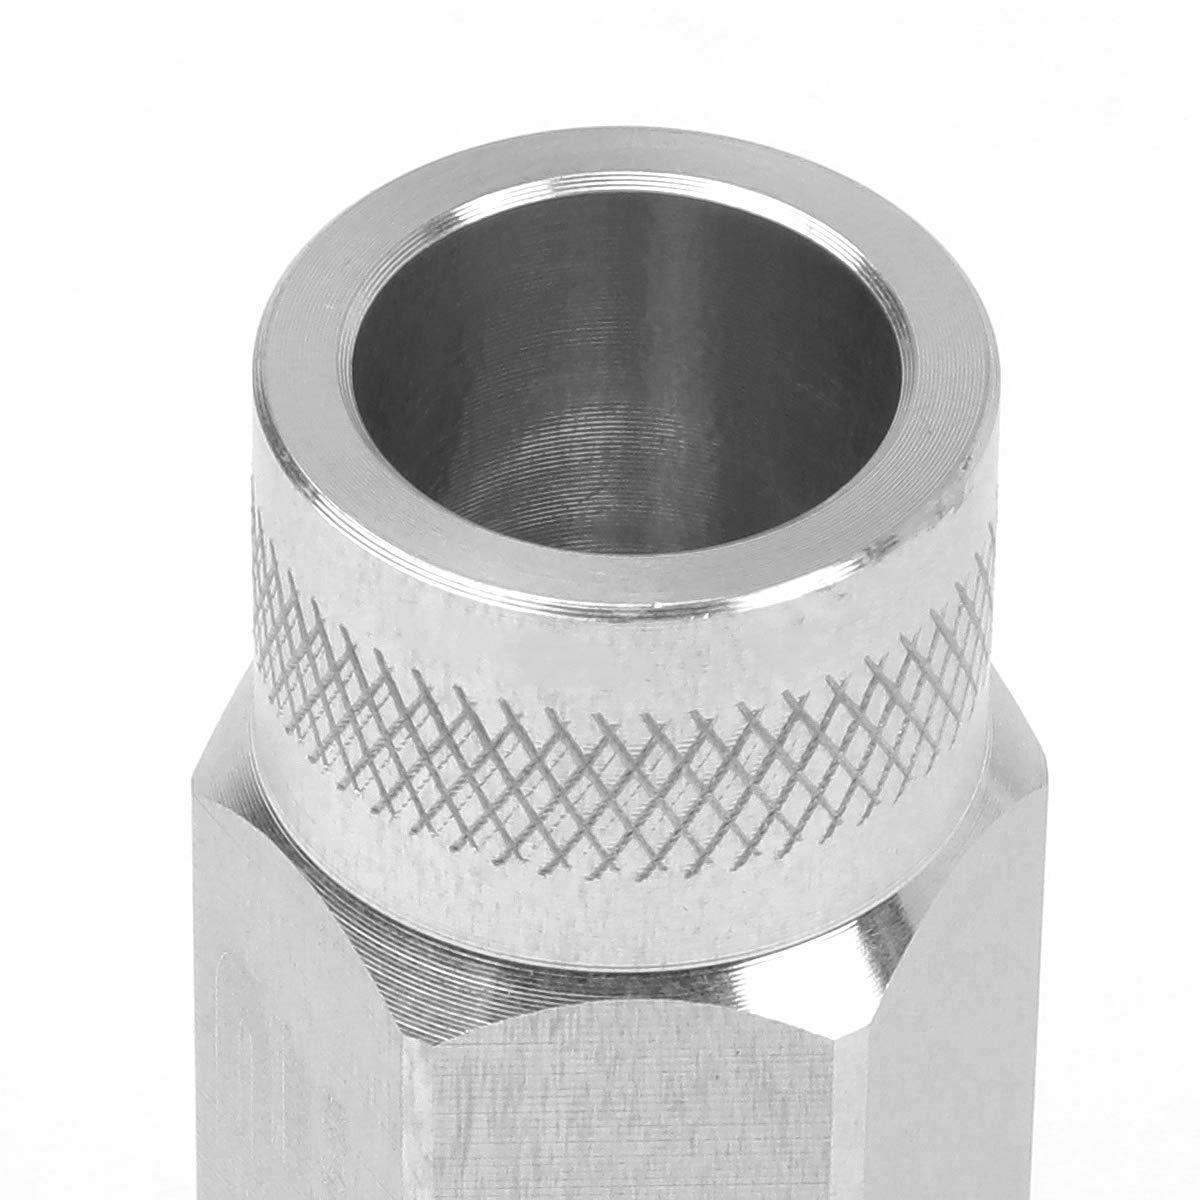 50mm Open End Lug Nut w//Socket Adapter DNA MOTORING LN-T7-014-15-RD Red J2 Engineering 7075 Aluminum M12X1.5 20Pcs L